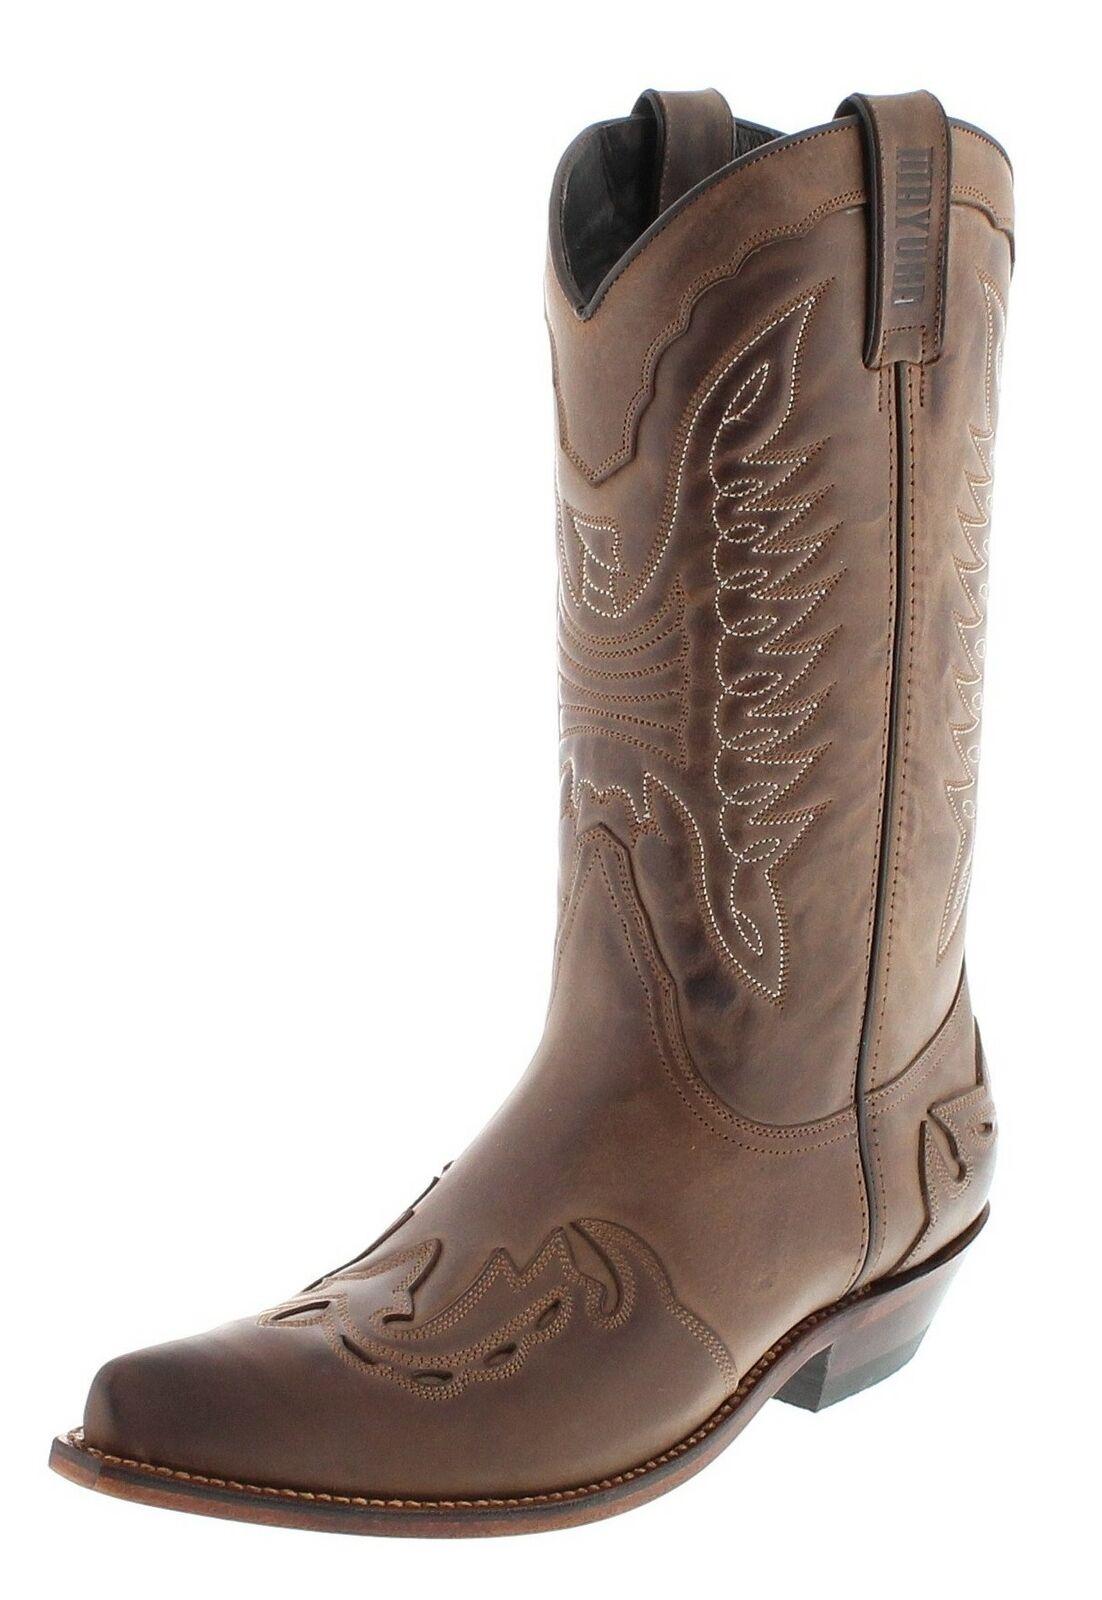 Mayura Stiefel MB017 Braun Westernstiefel Cowboystiefel